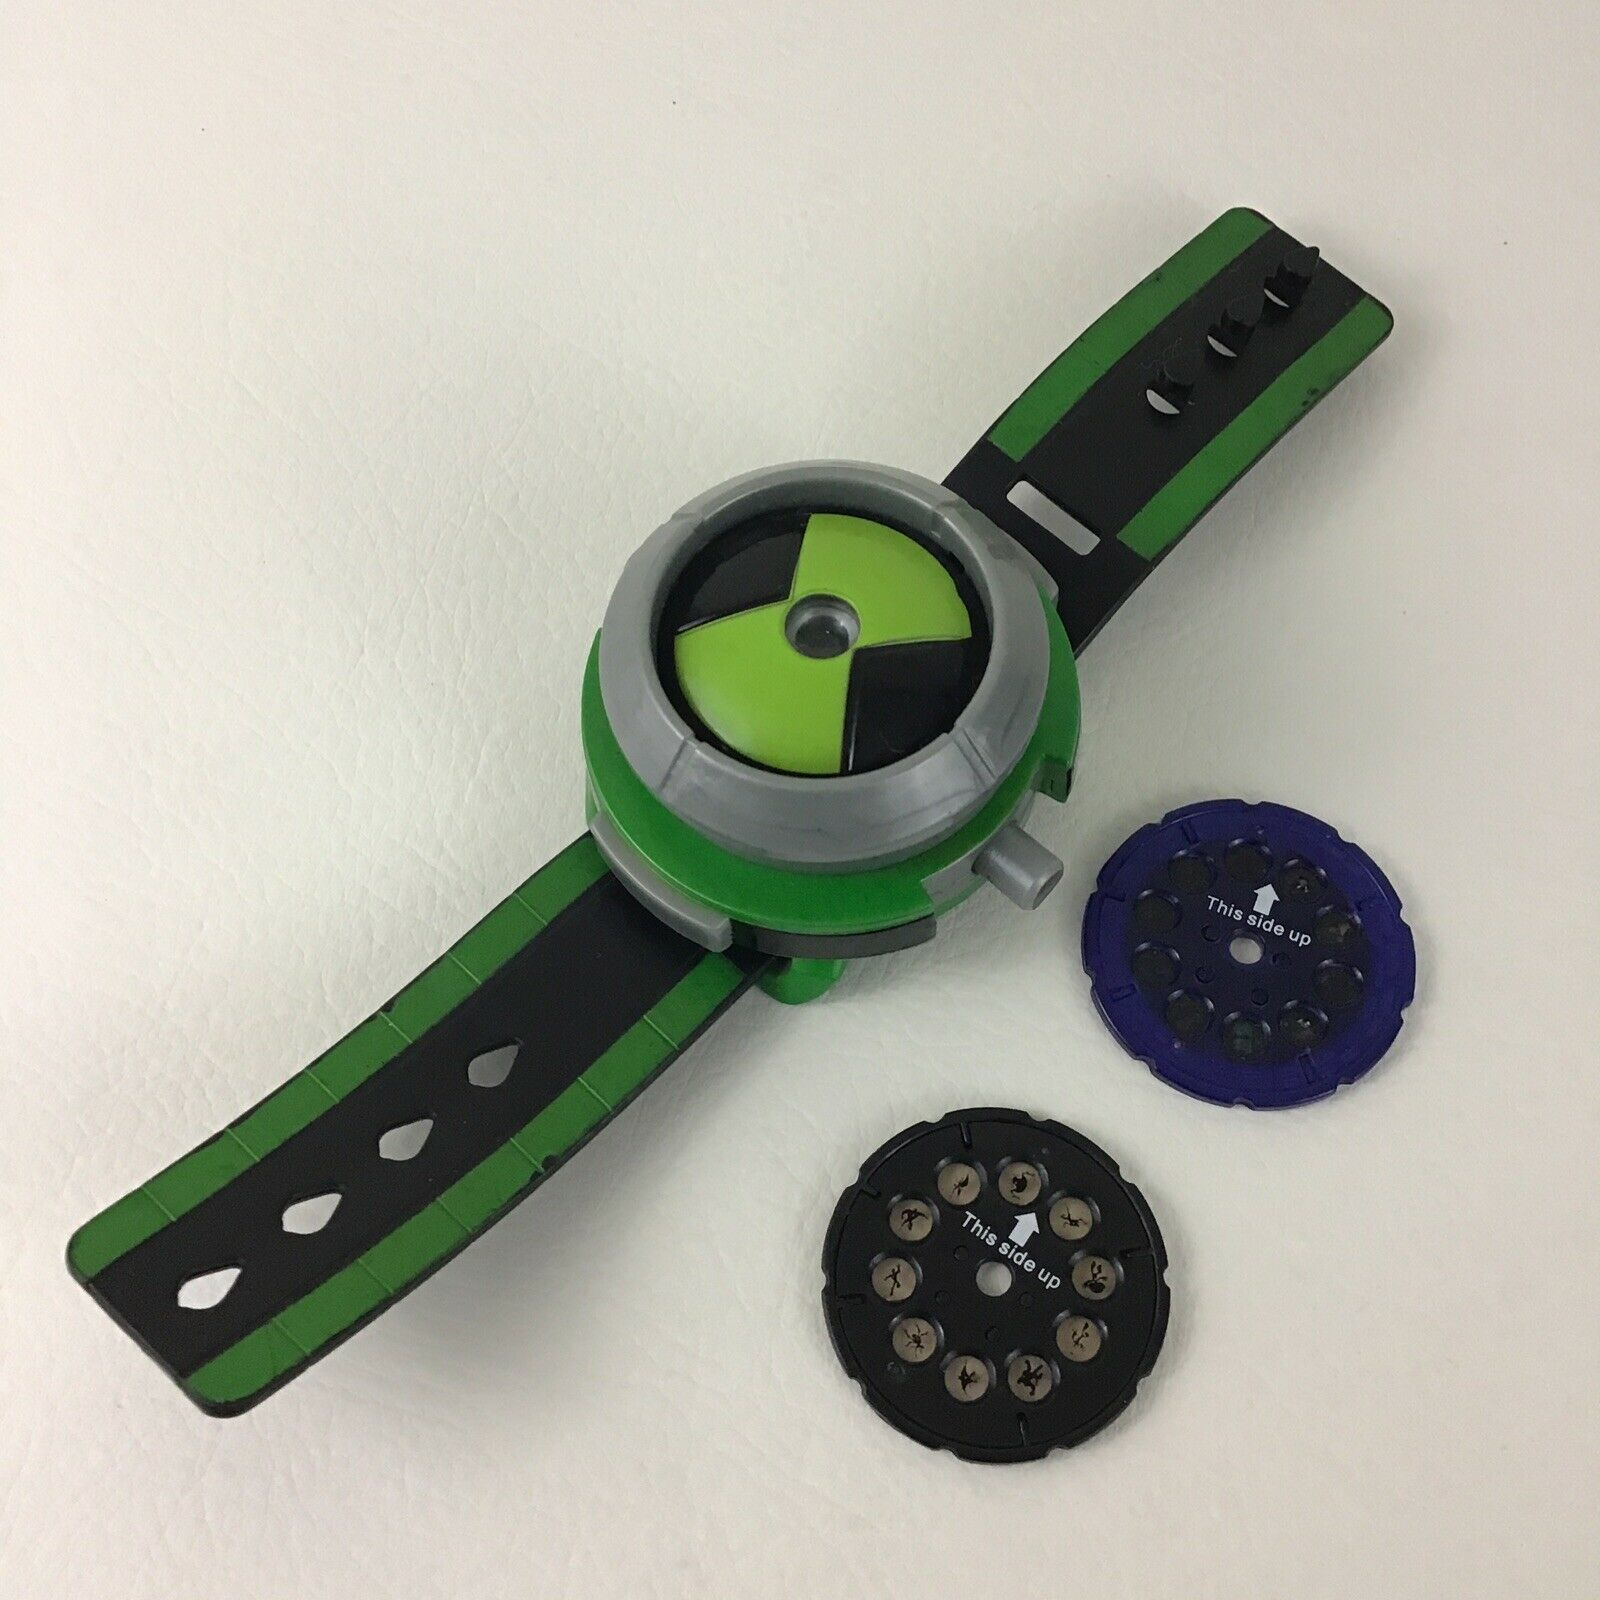 Ben 10 Projector Omnitrix Lights Toy Watch Discs Cartoon Network Bandai 2008 - $38.27